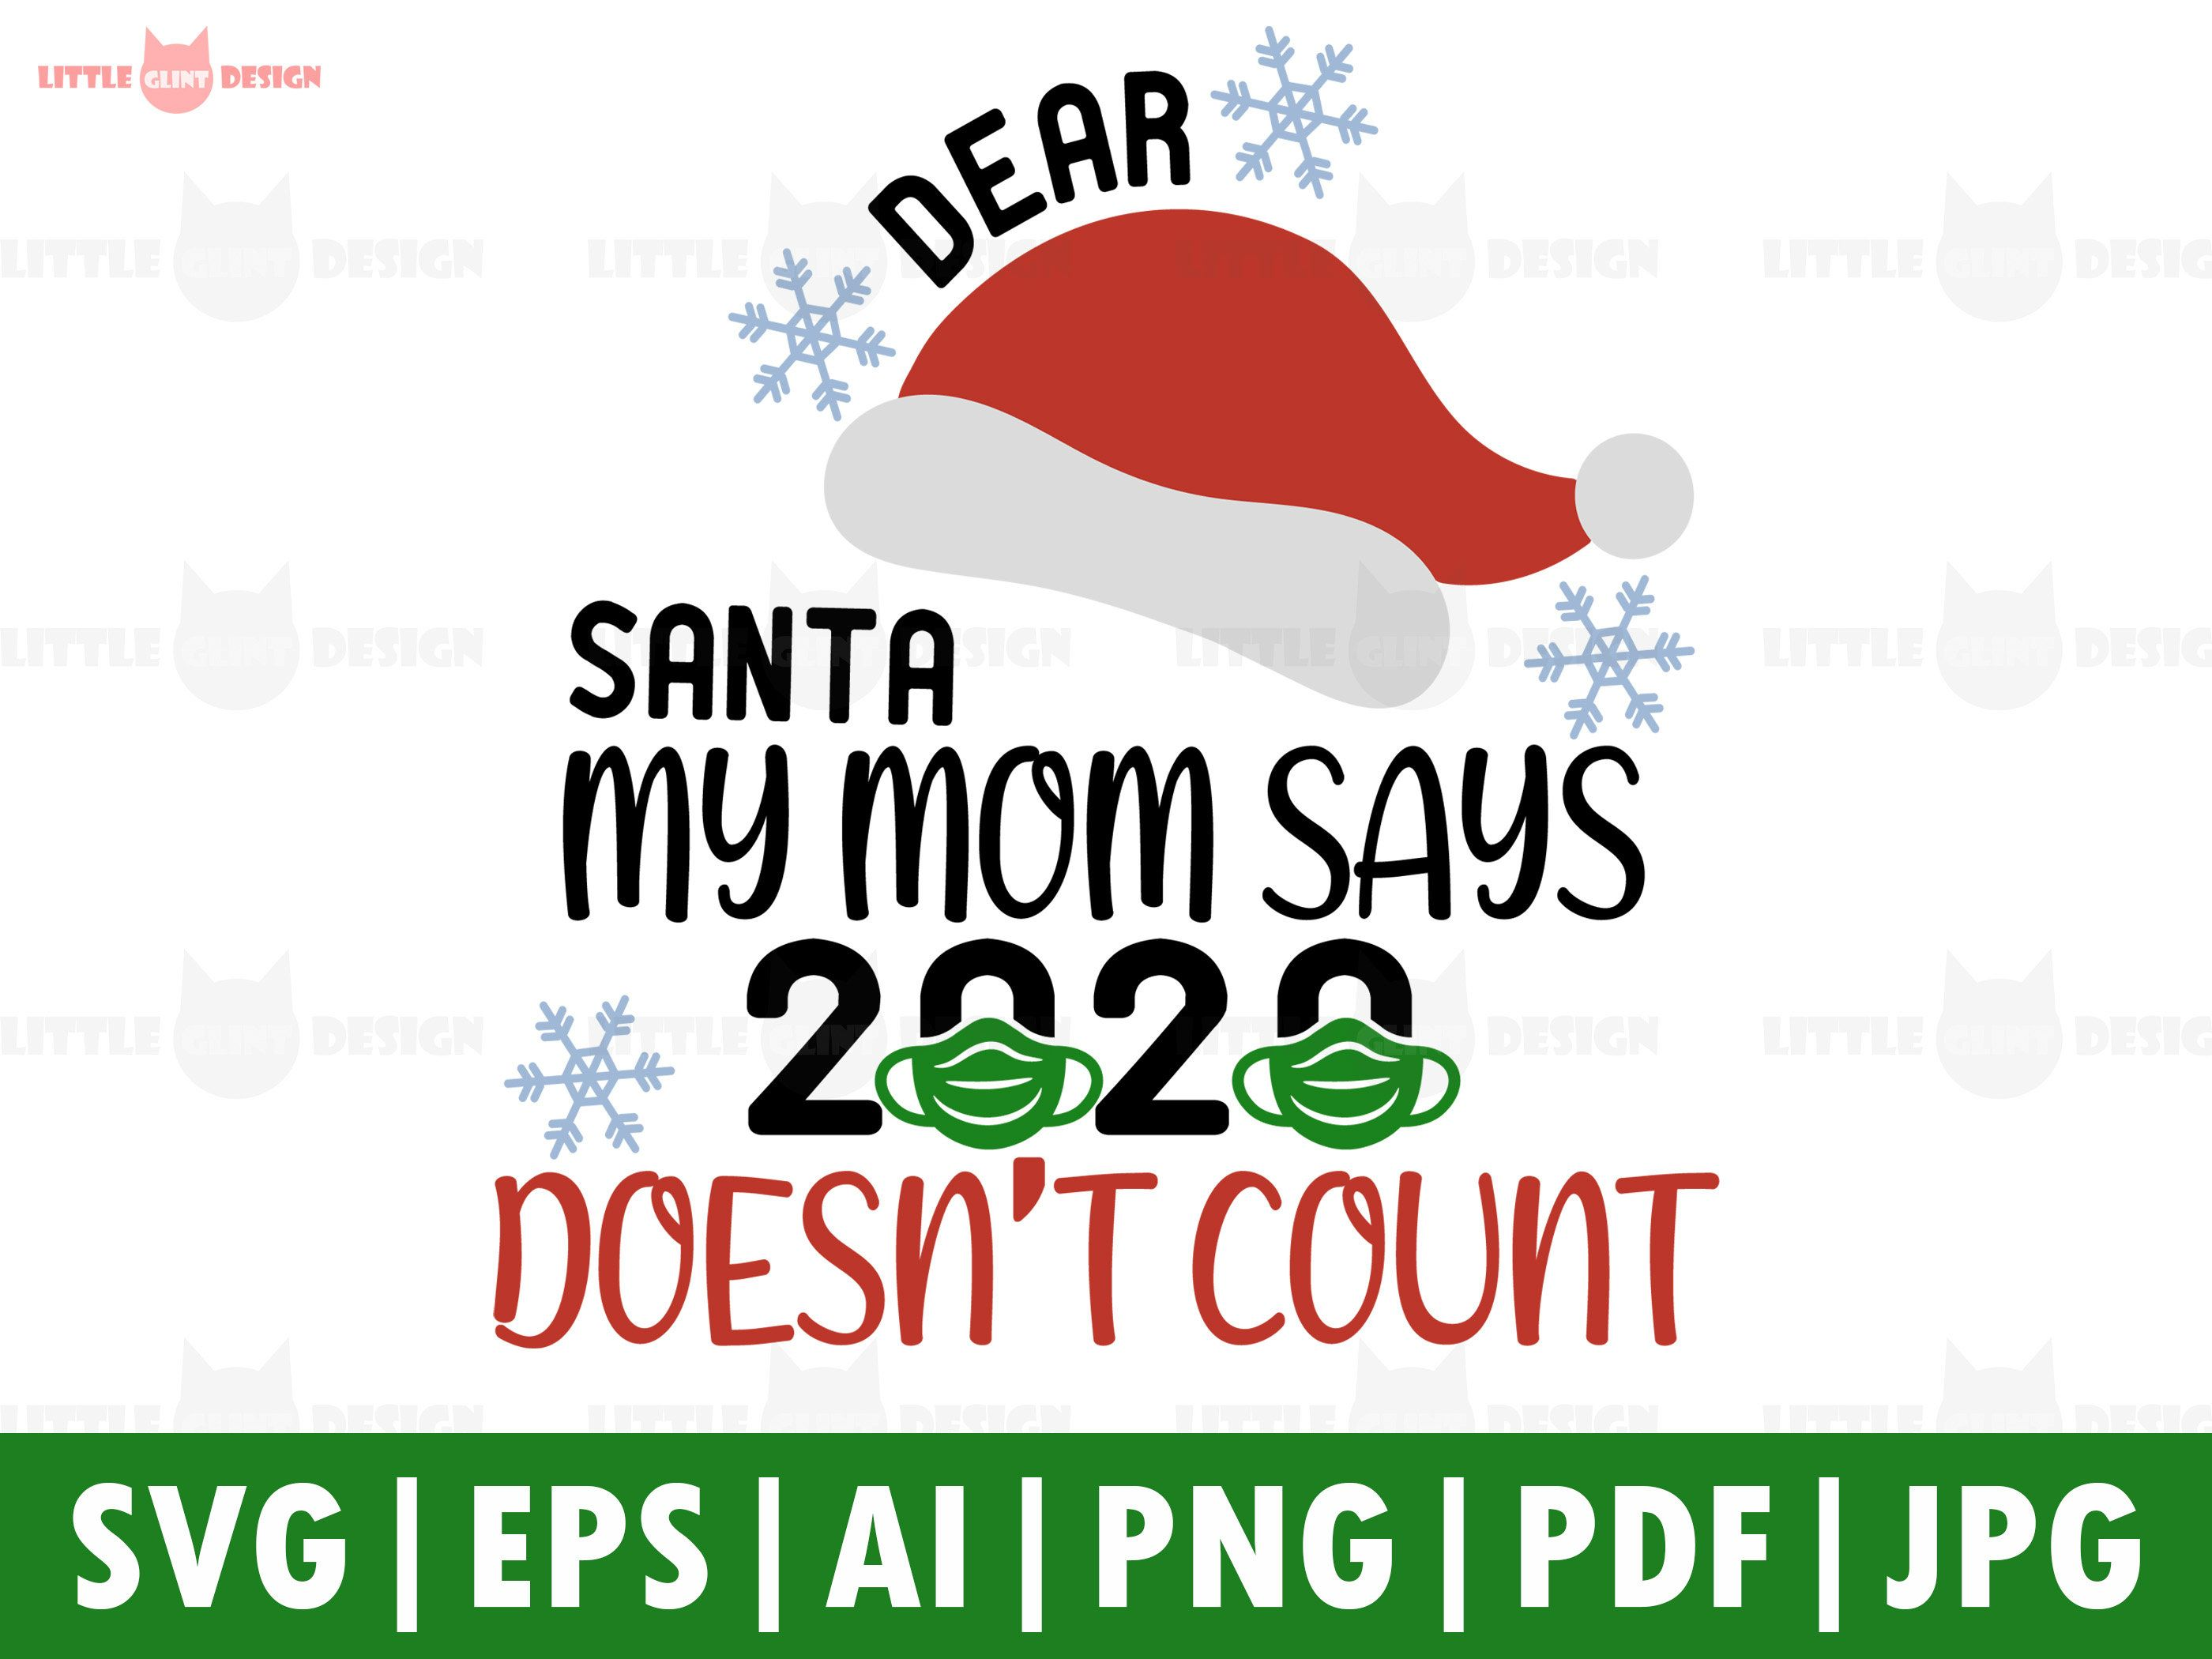 Dear Santa My Mom Says 2020 Doesn T Count Svg Santa Mask Etsy In 2020 Winter Svg Svg Cricut